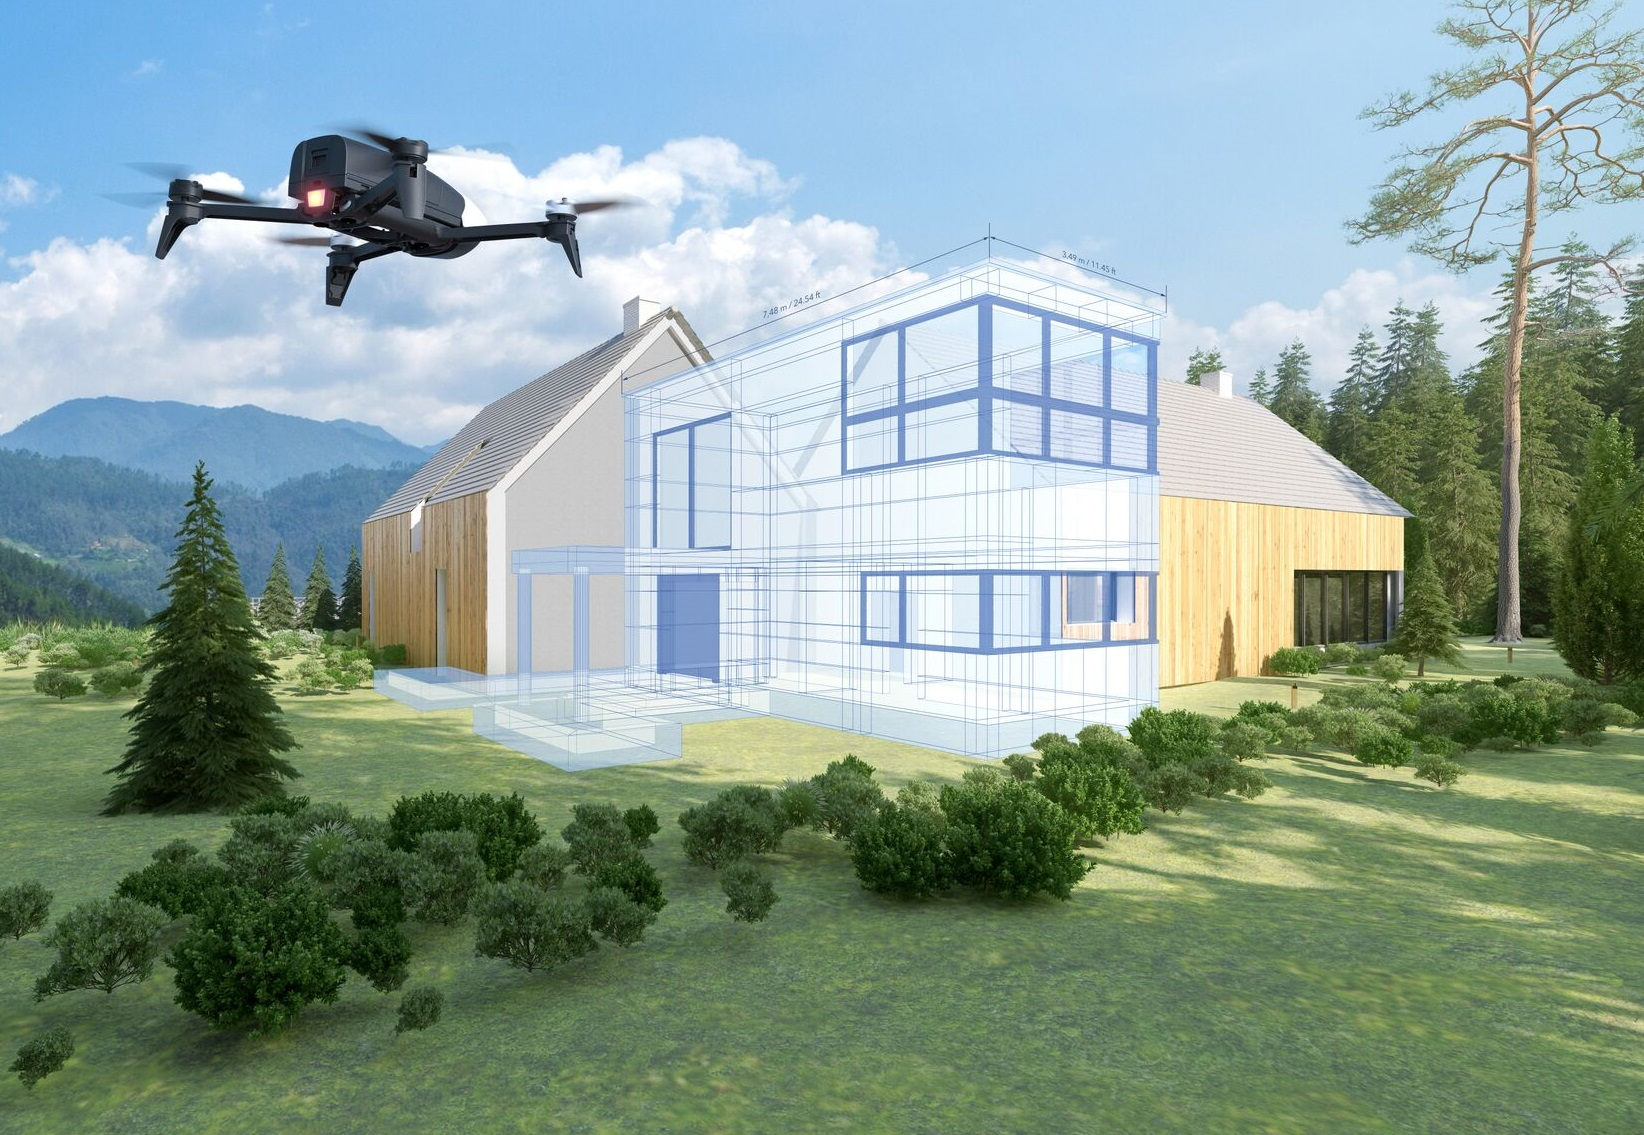 Parrot Professional joins 3D Robotics in repackaging consumer drones as enterprise solutions